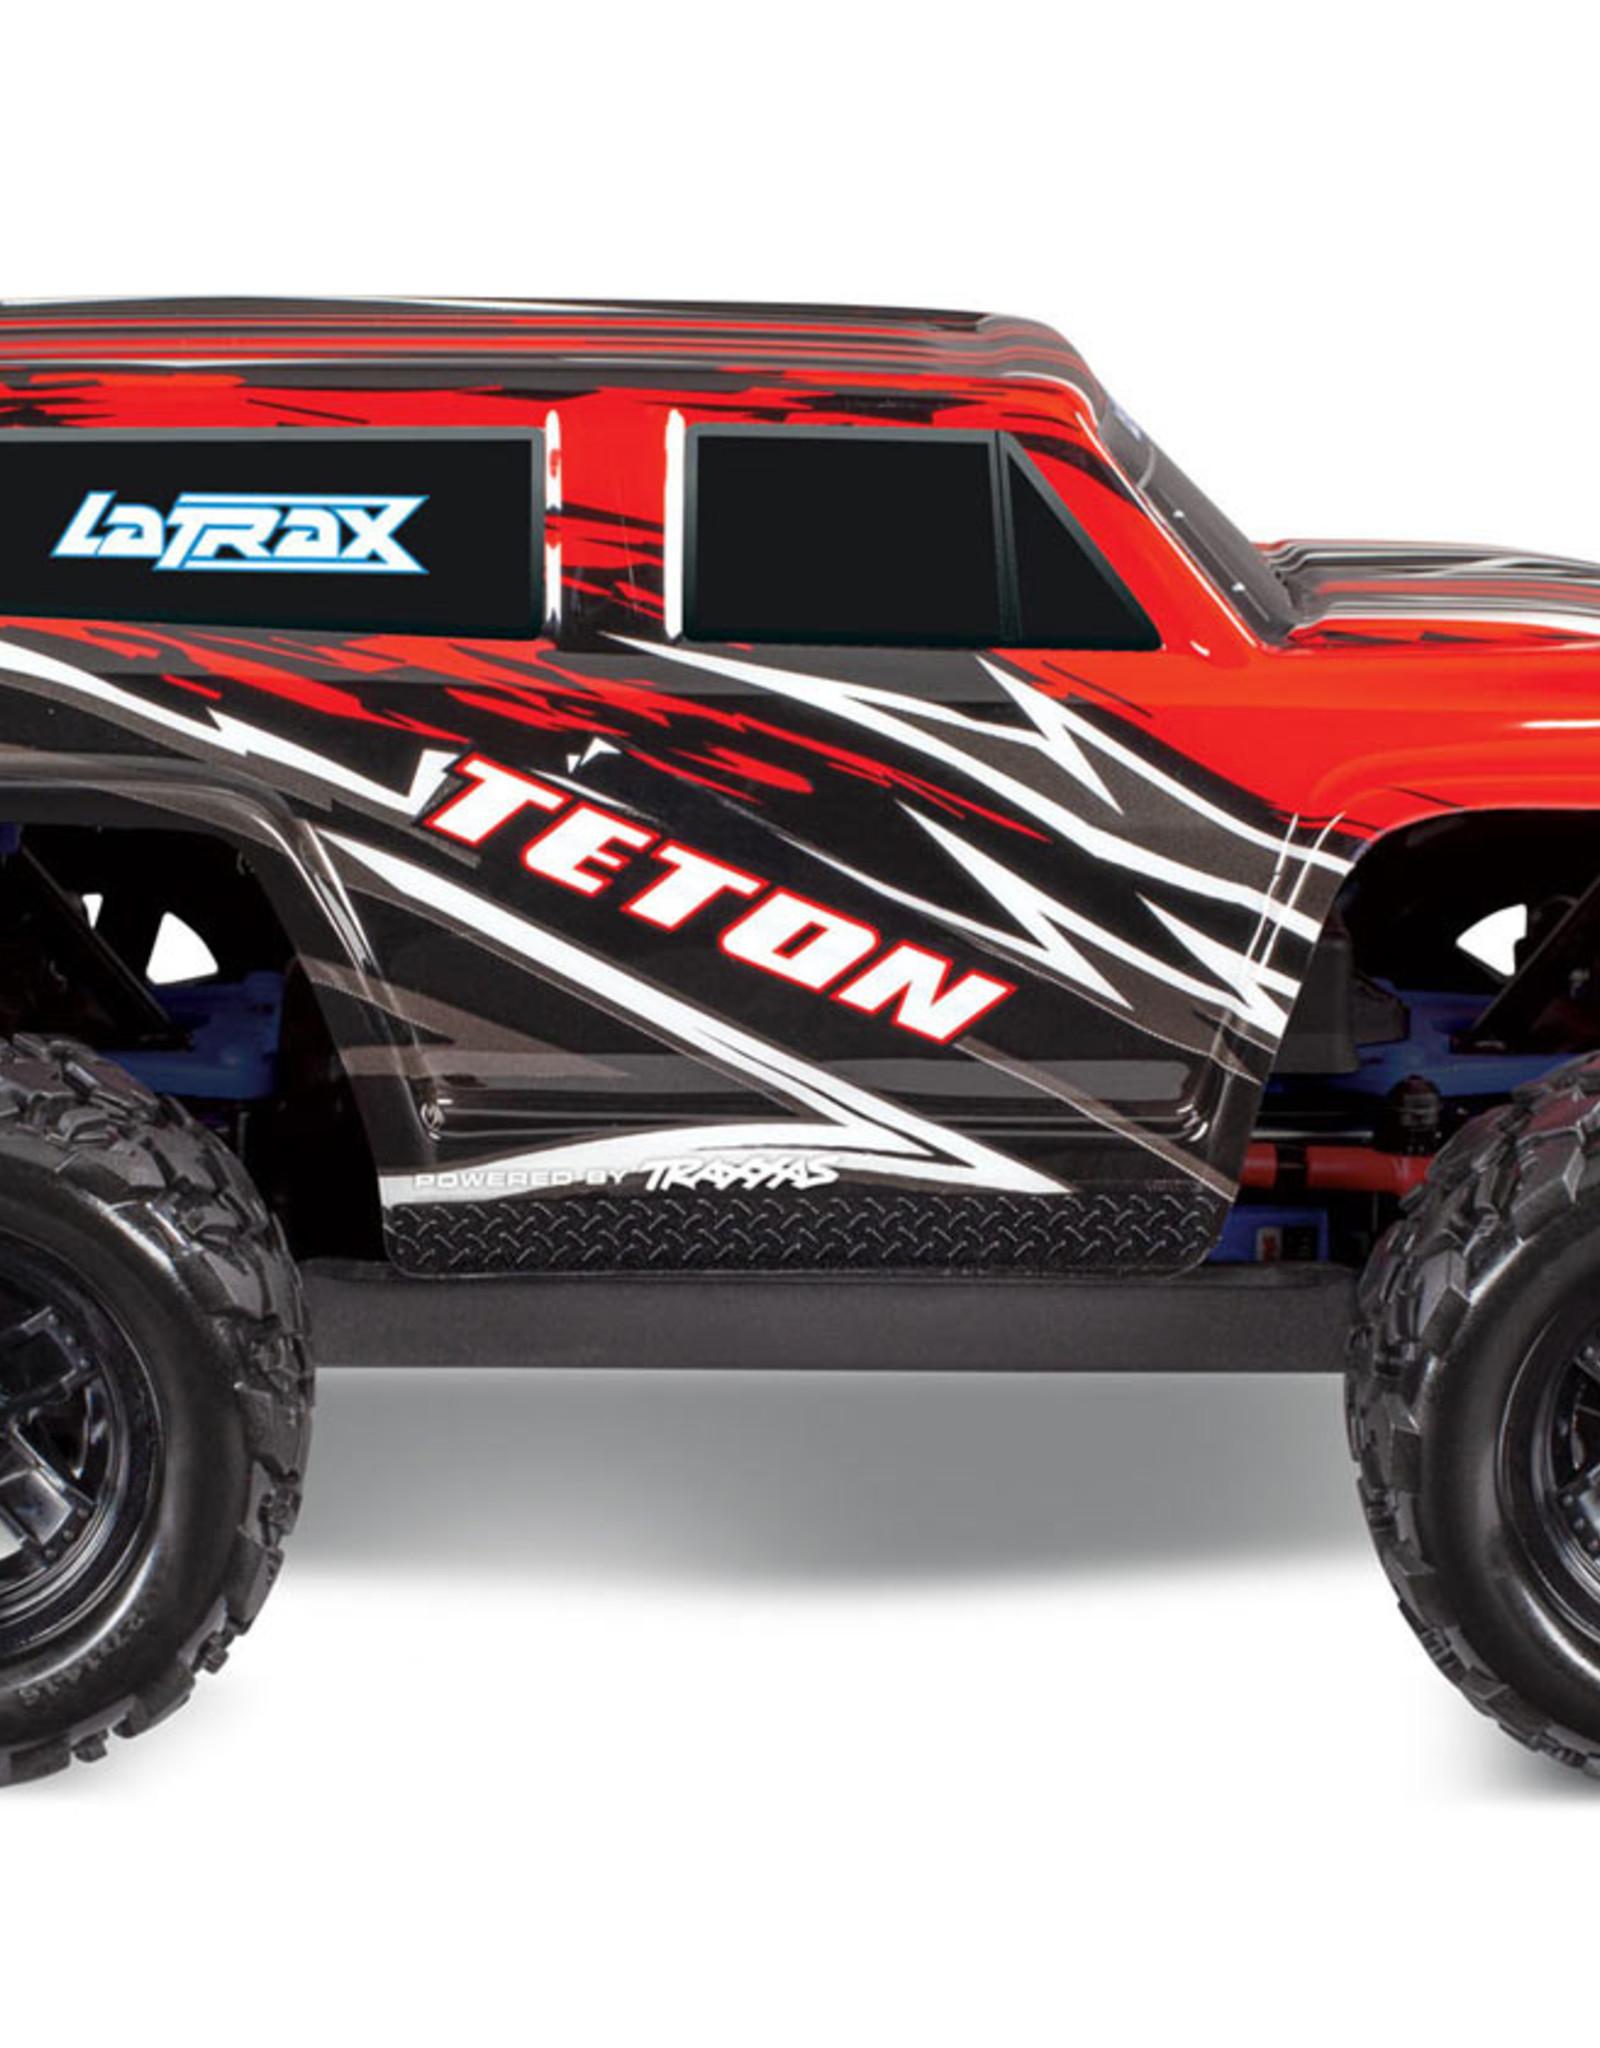 Traxxas LaTrax 1/18 TETON WITH AC CHARGER